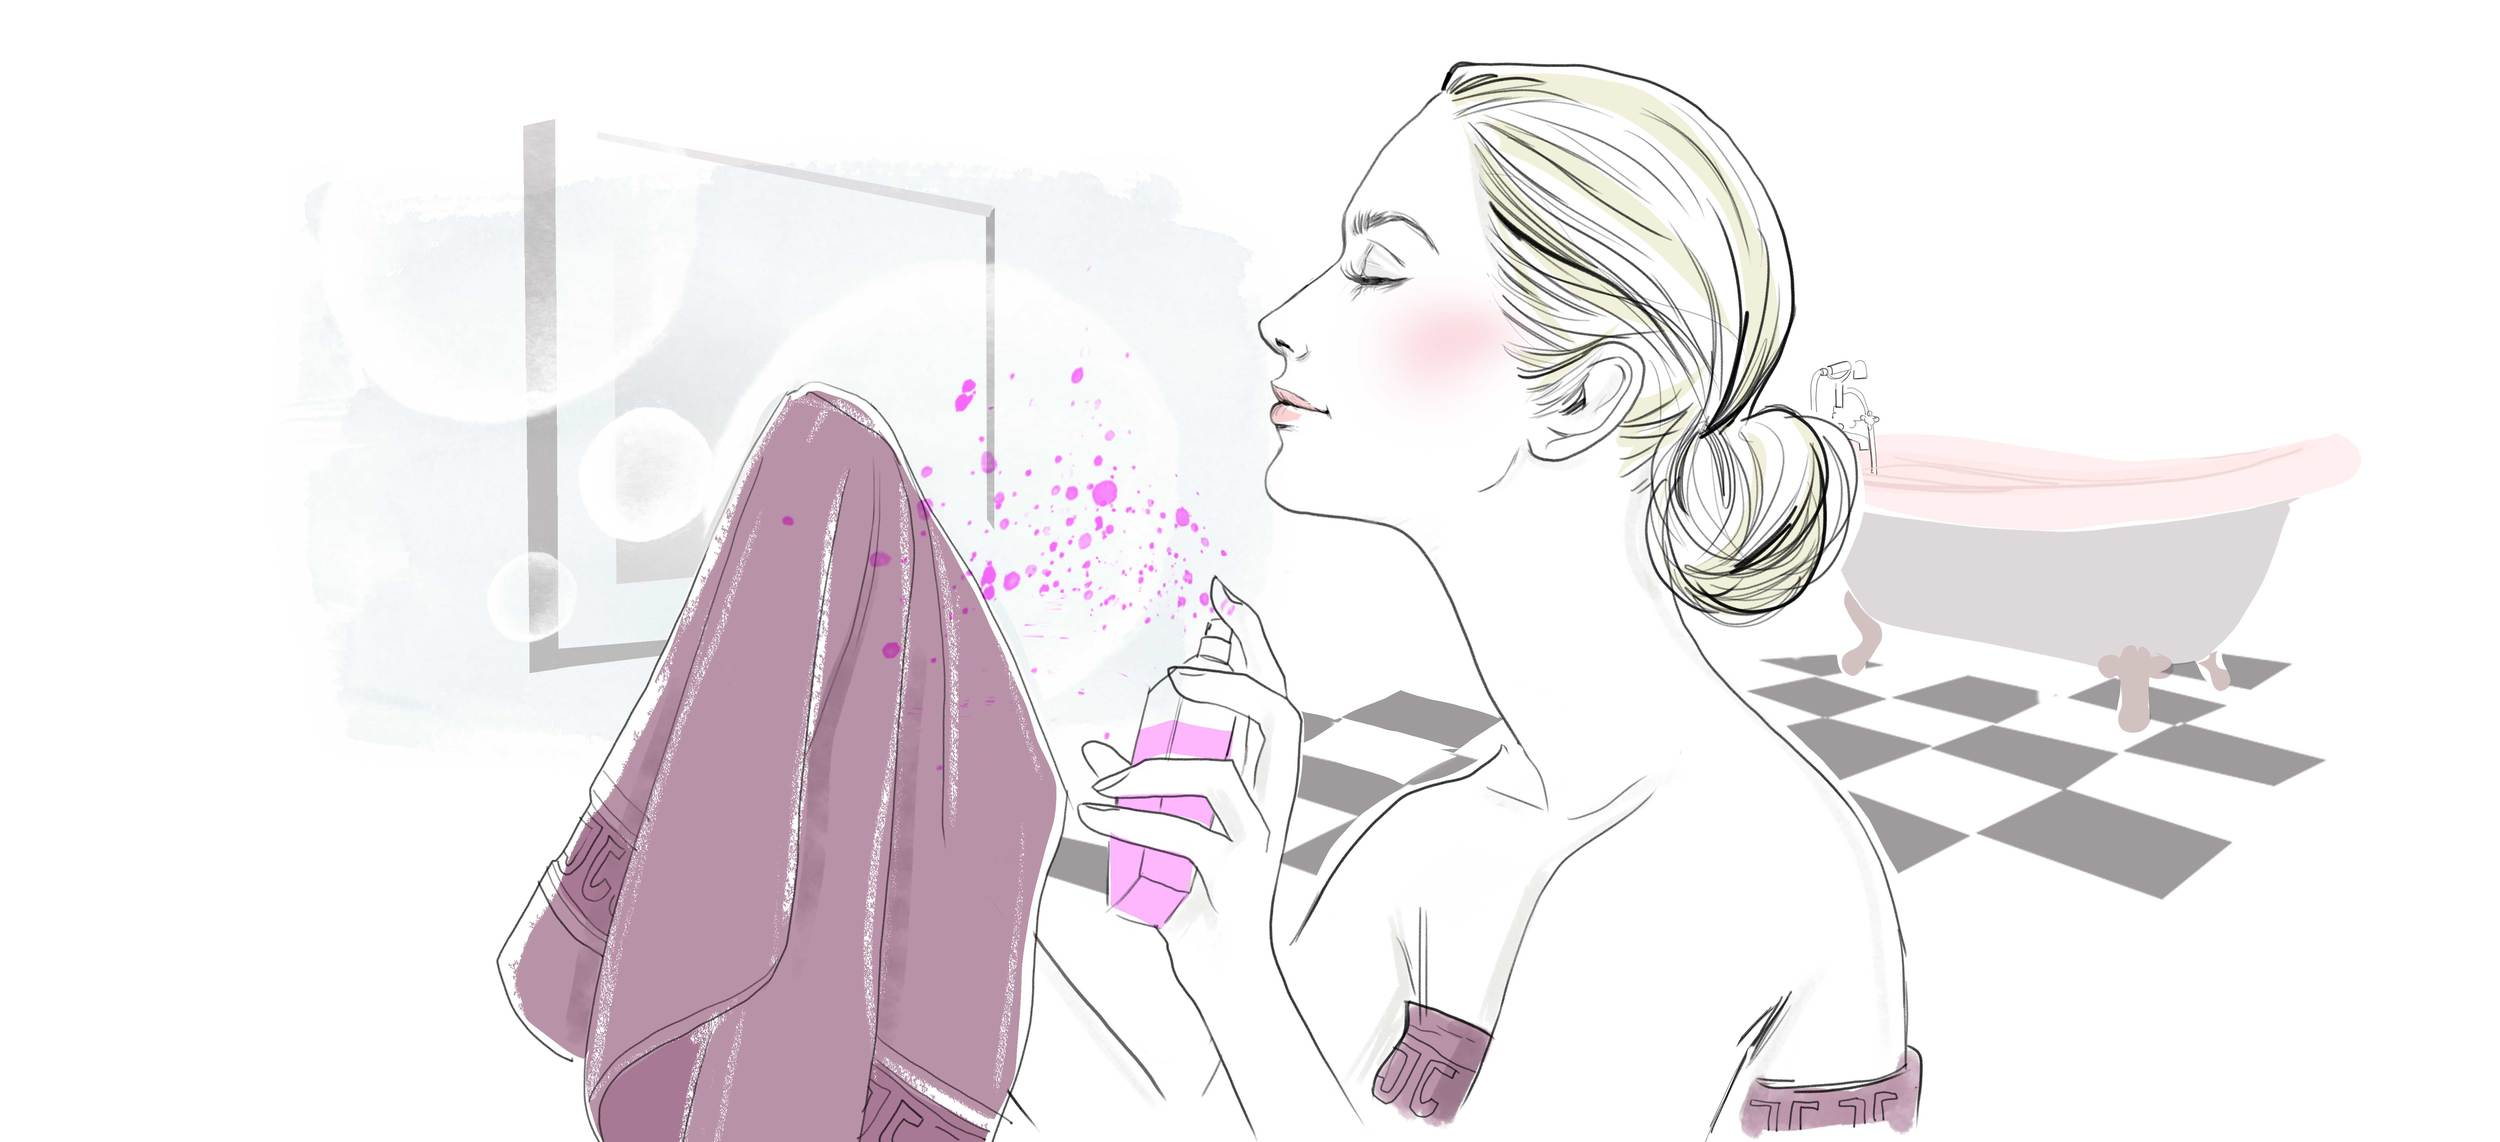 _#1-towel-spray-with_mirror.jpg